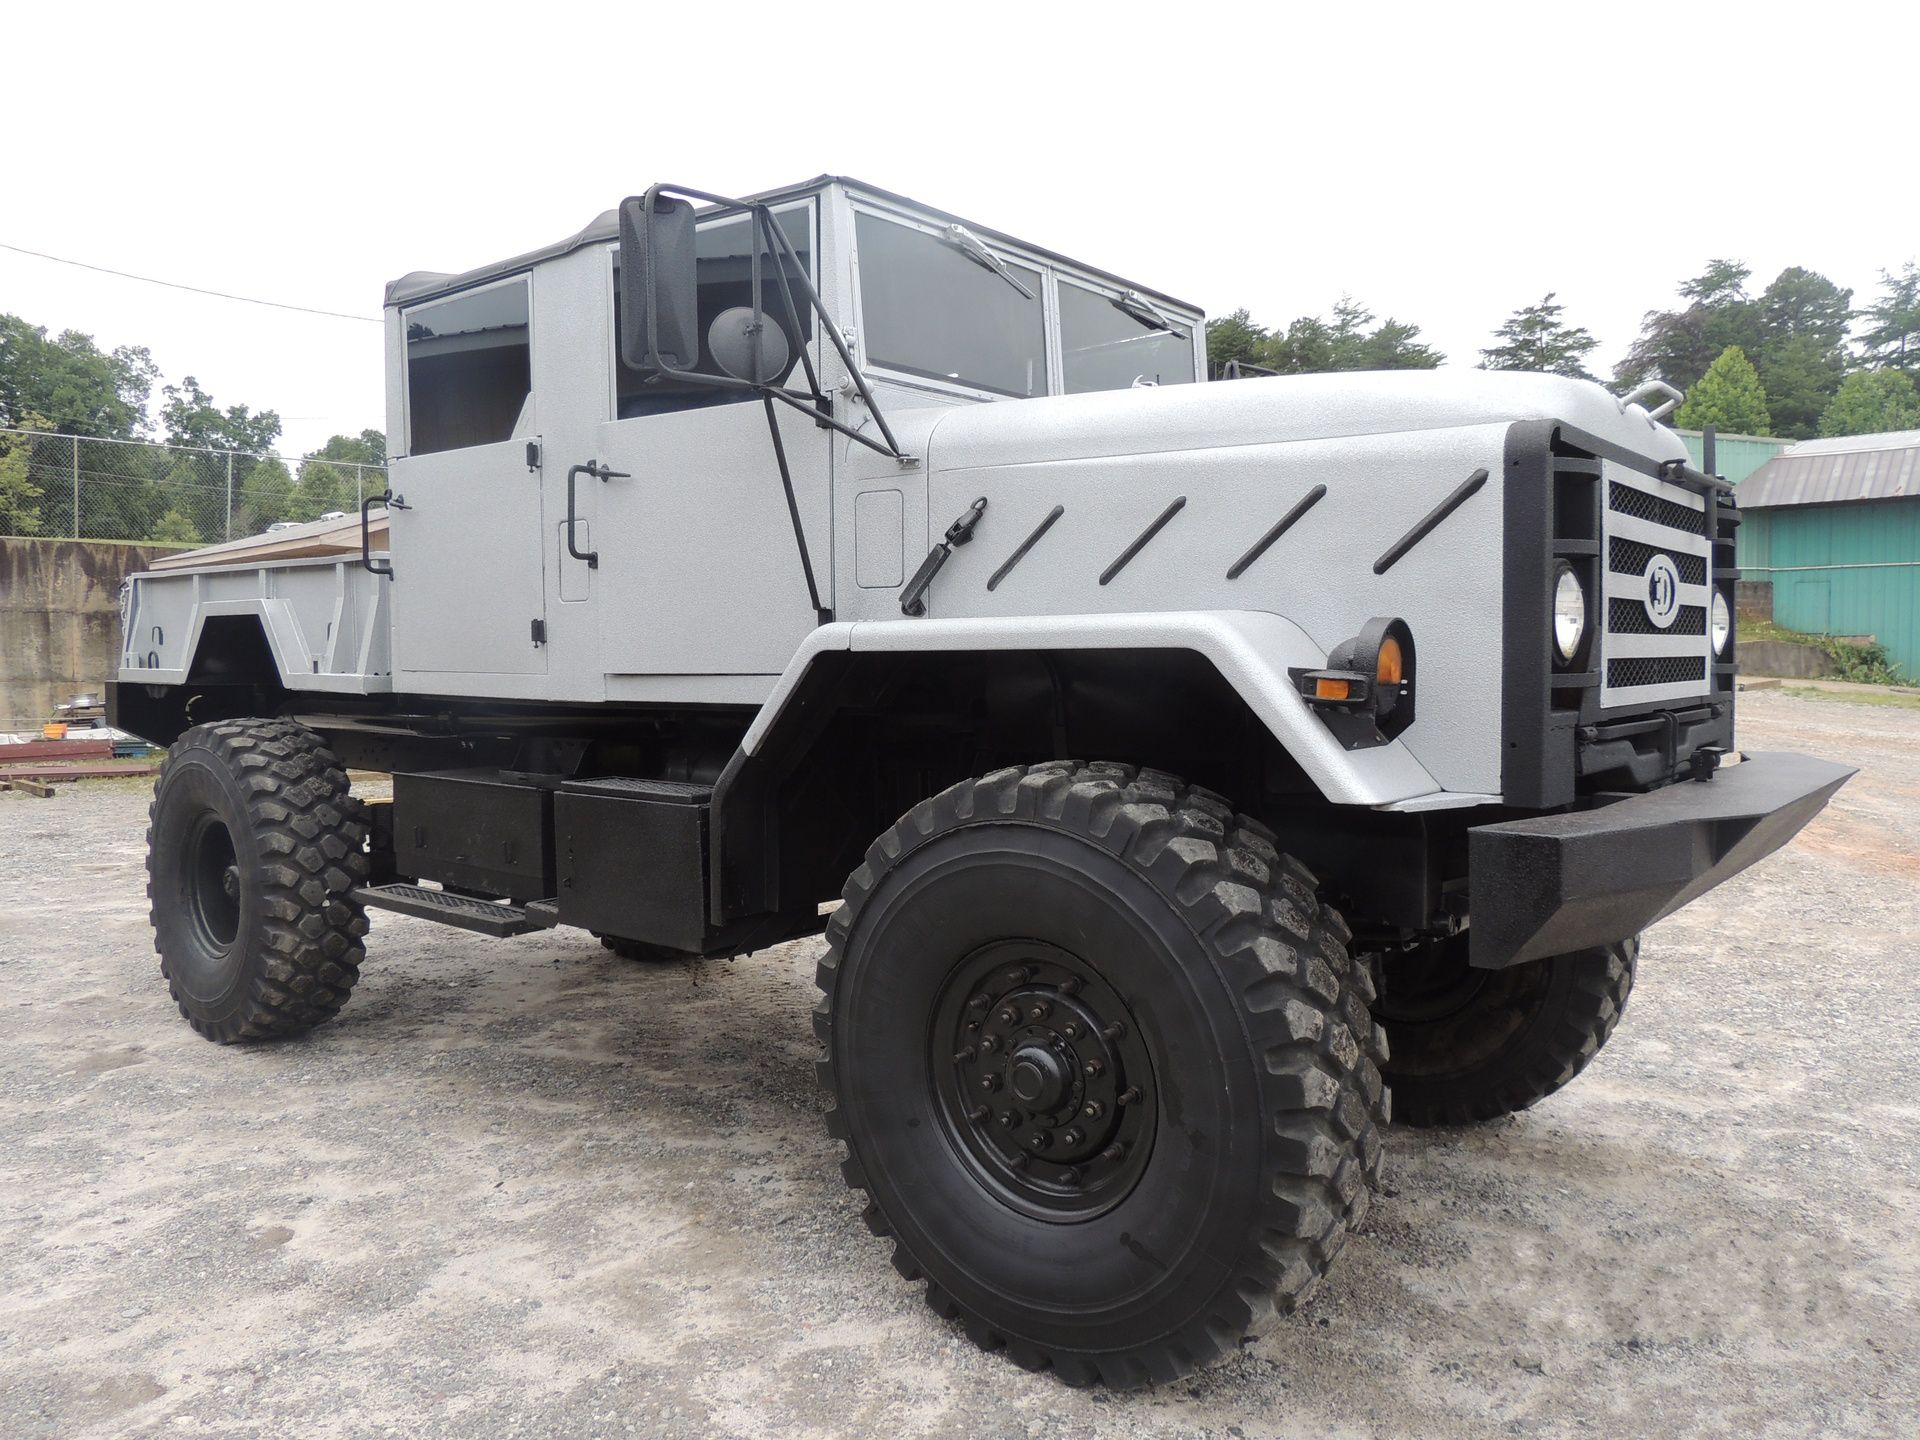 custom combat trucks llc trucks pinterest vehicle 4x4 and cars. Black Bedroom Furniture Sets. Home Design Ideas